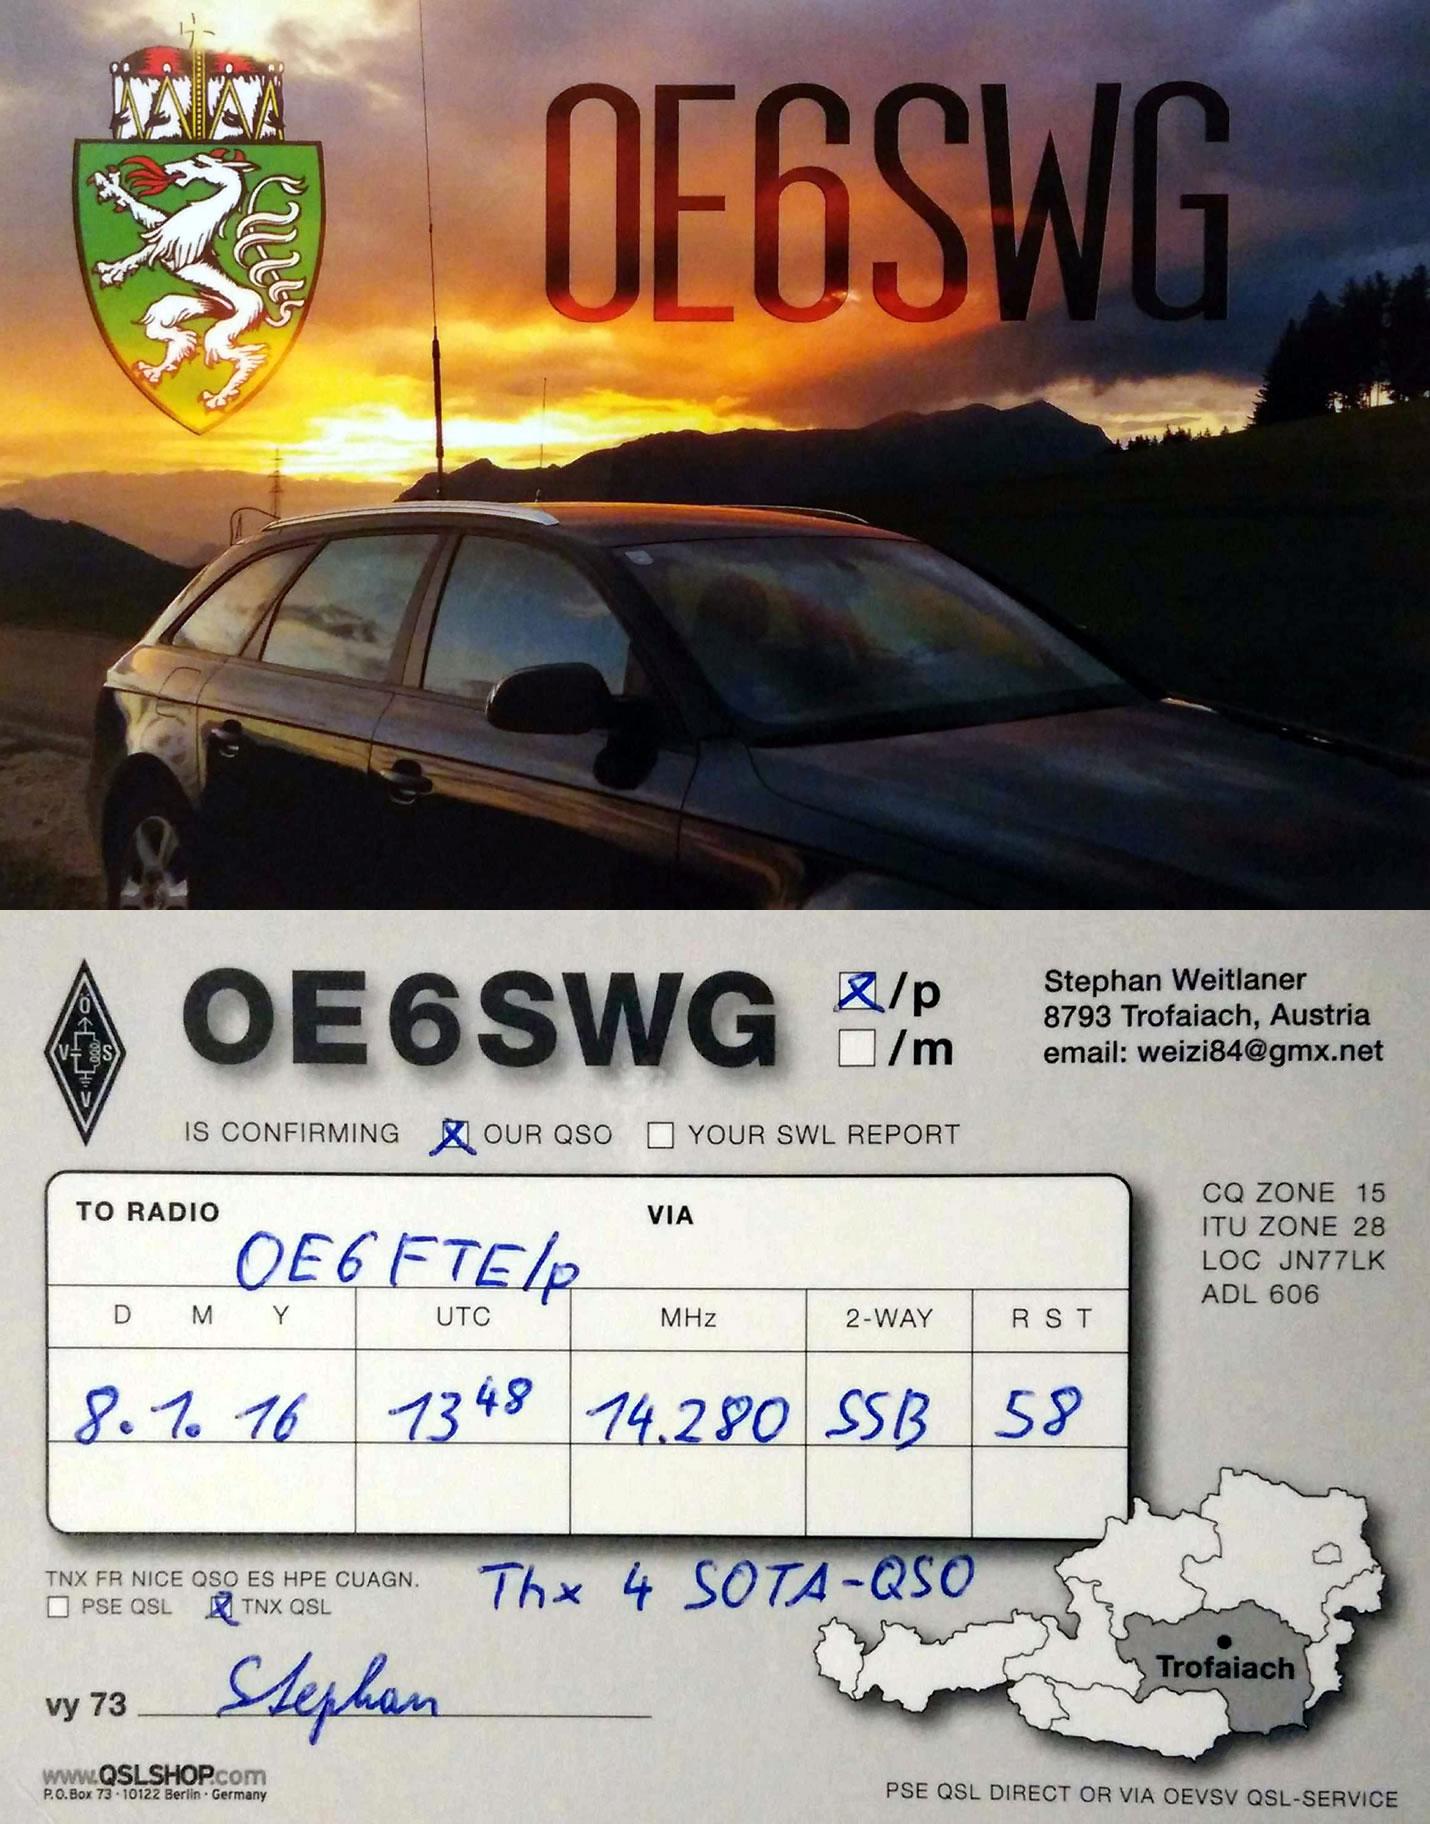 OE6SWG/P